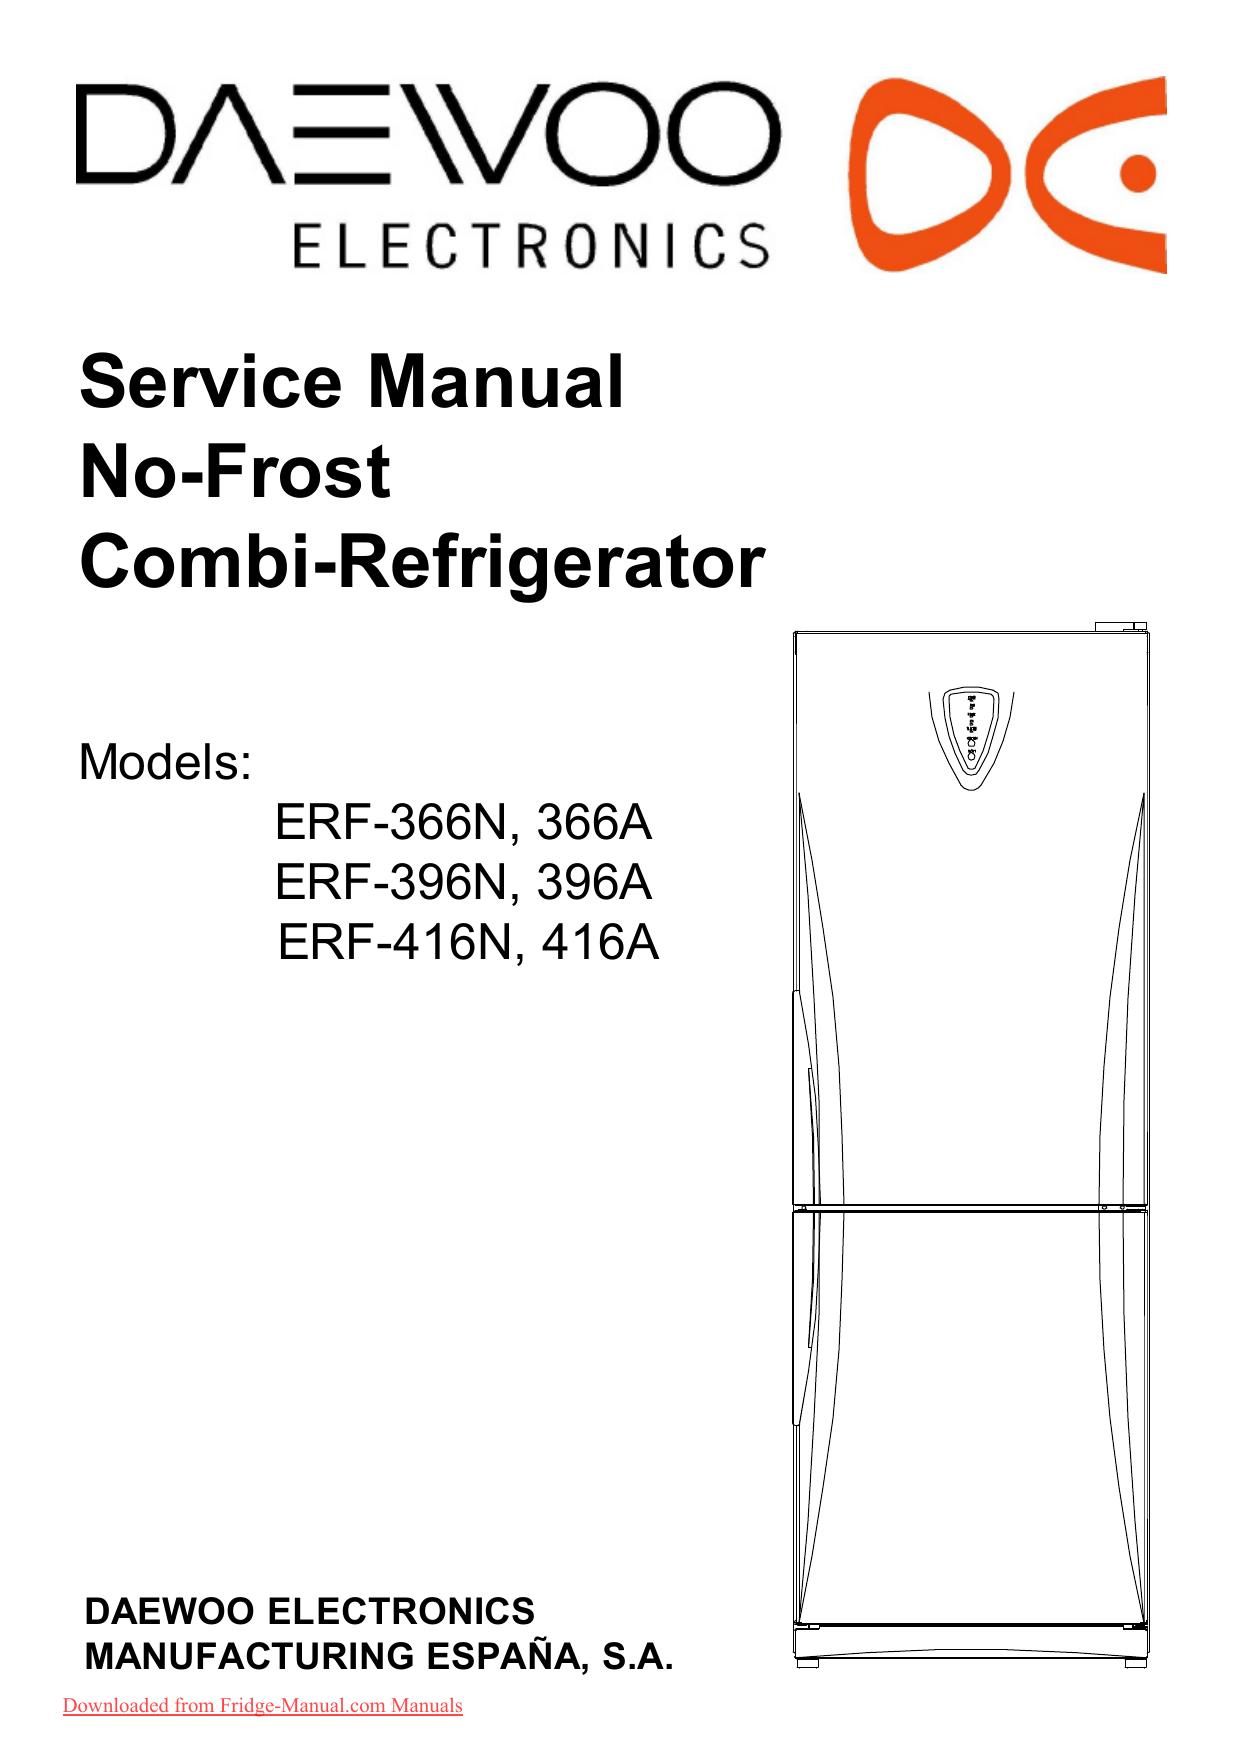 Daewoo ERF-396 User Guide Manual PDF - Fridge | manualzz.com on